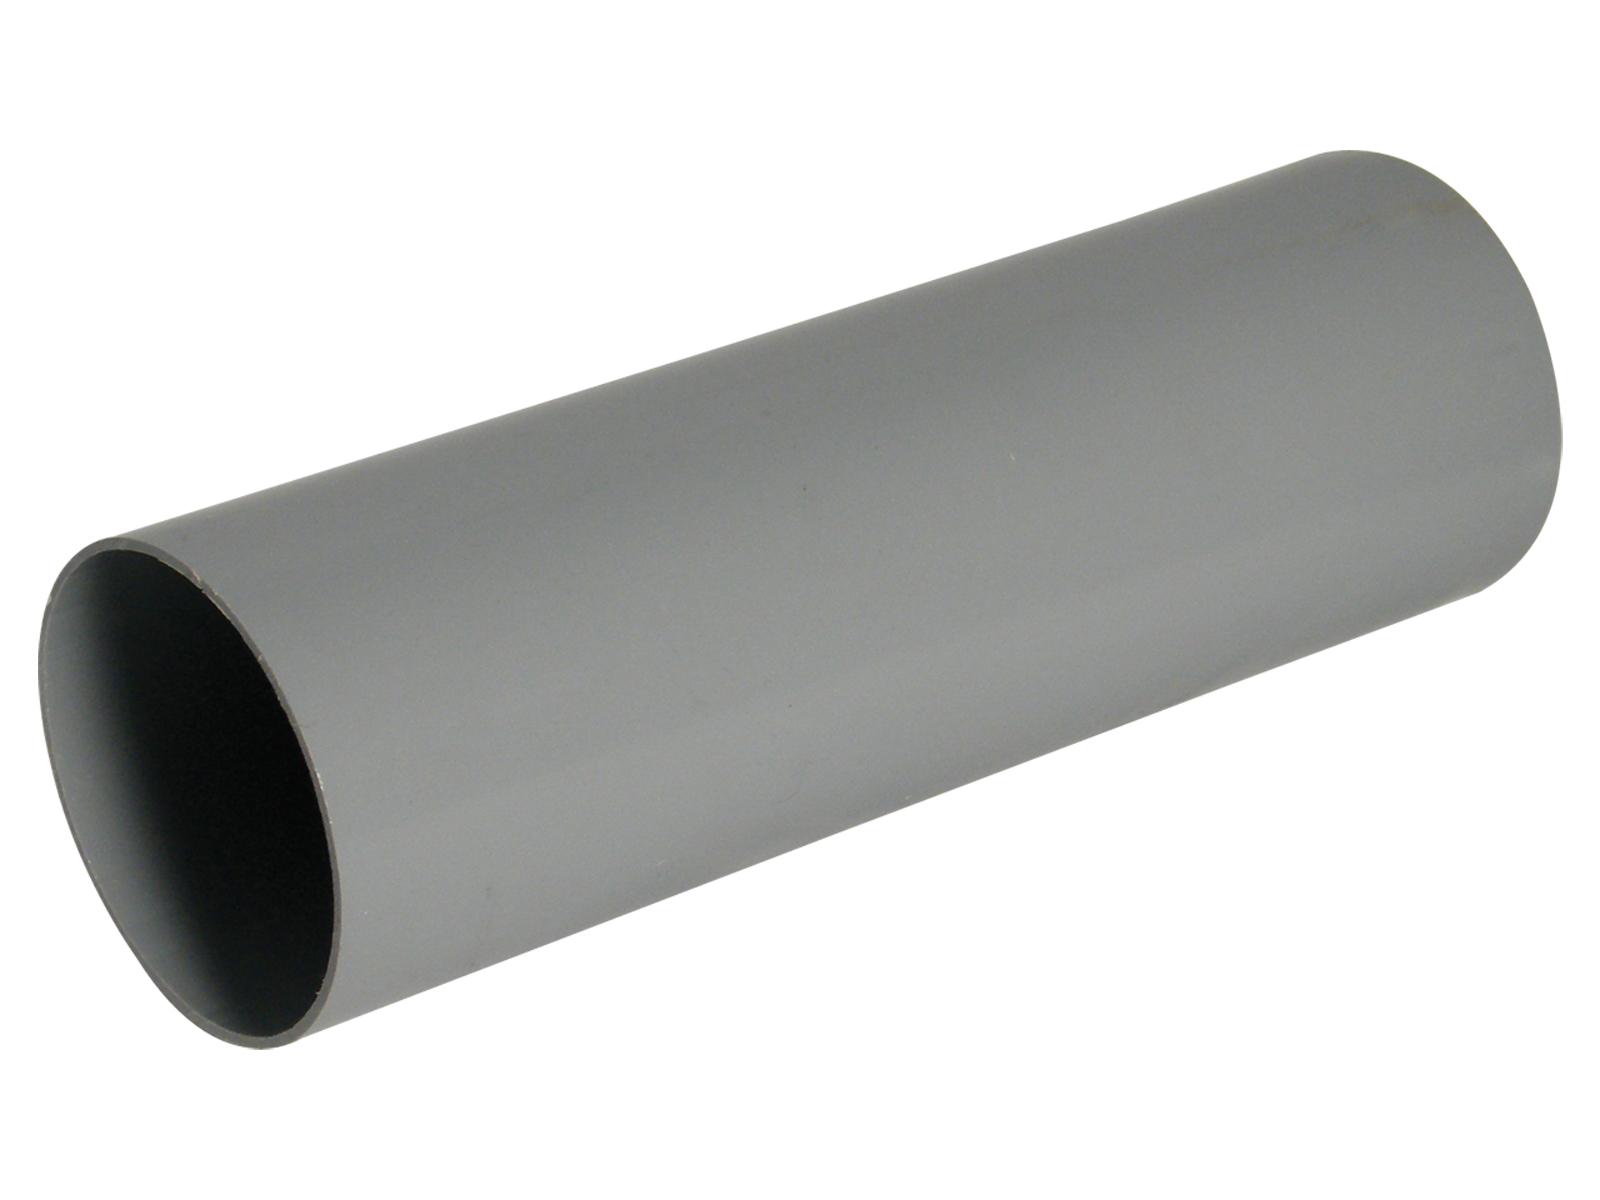 Floplast RP2.5GR 68mm Round Downpipe 2.5 Metre - Grey